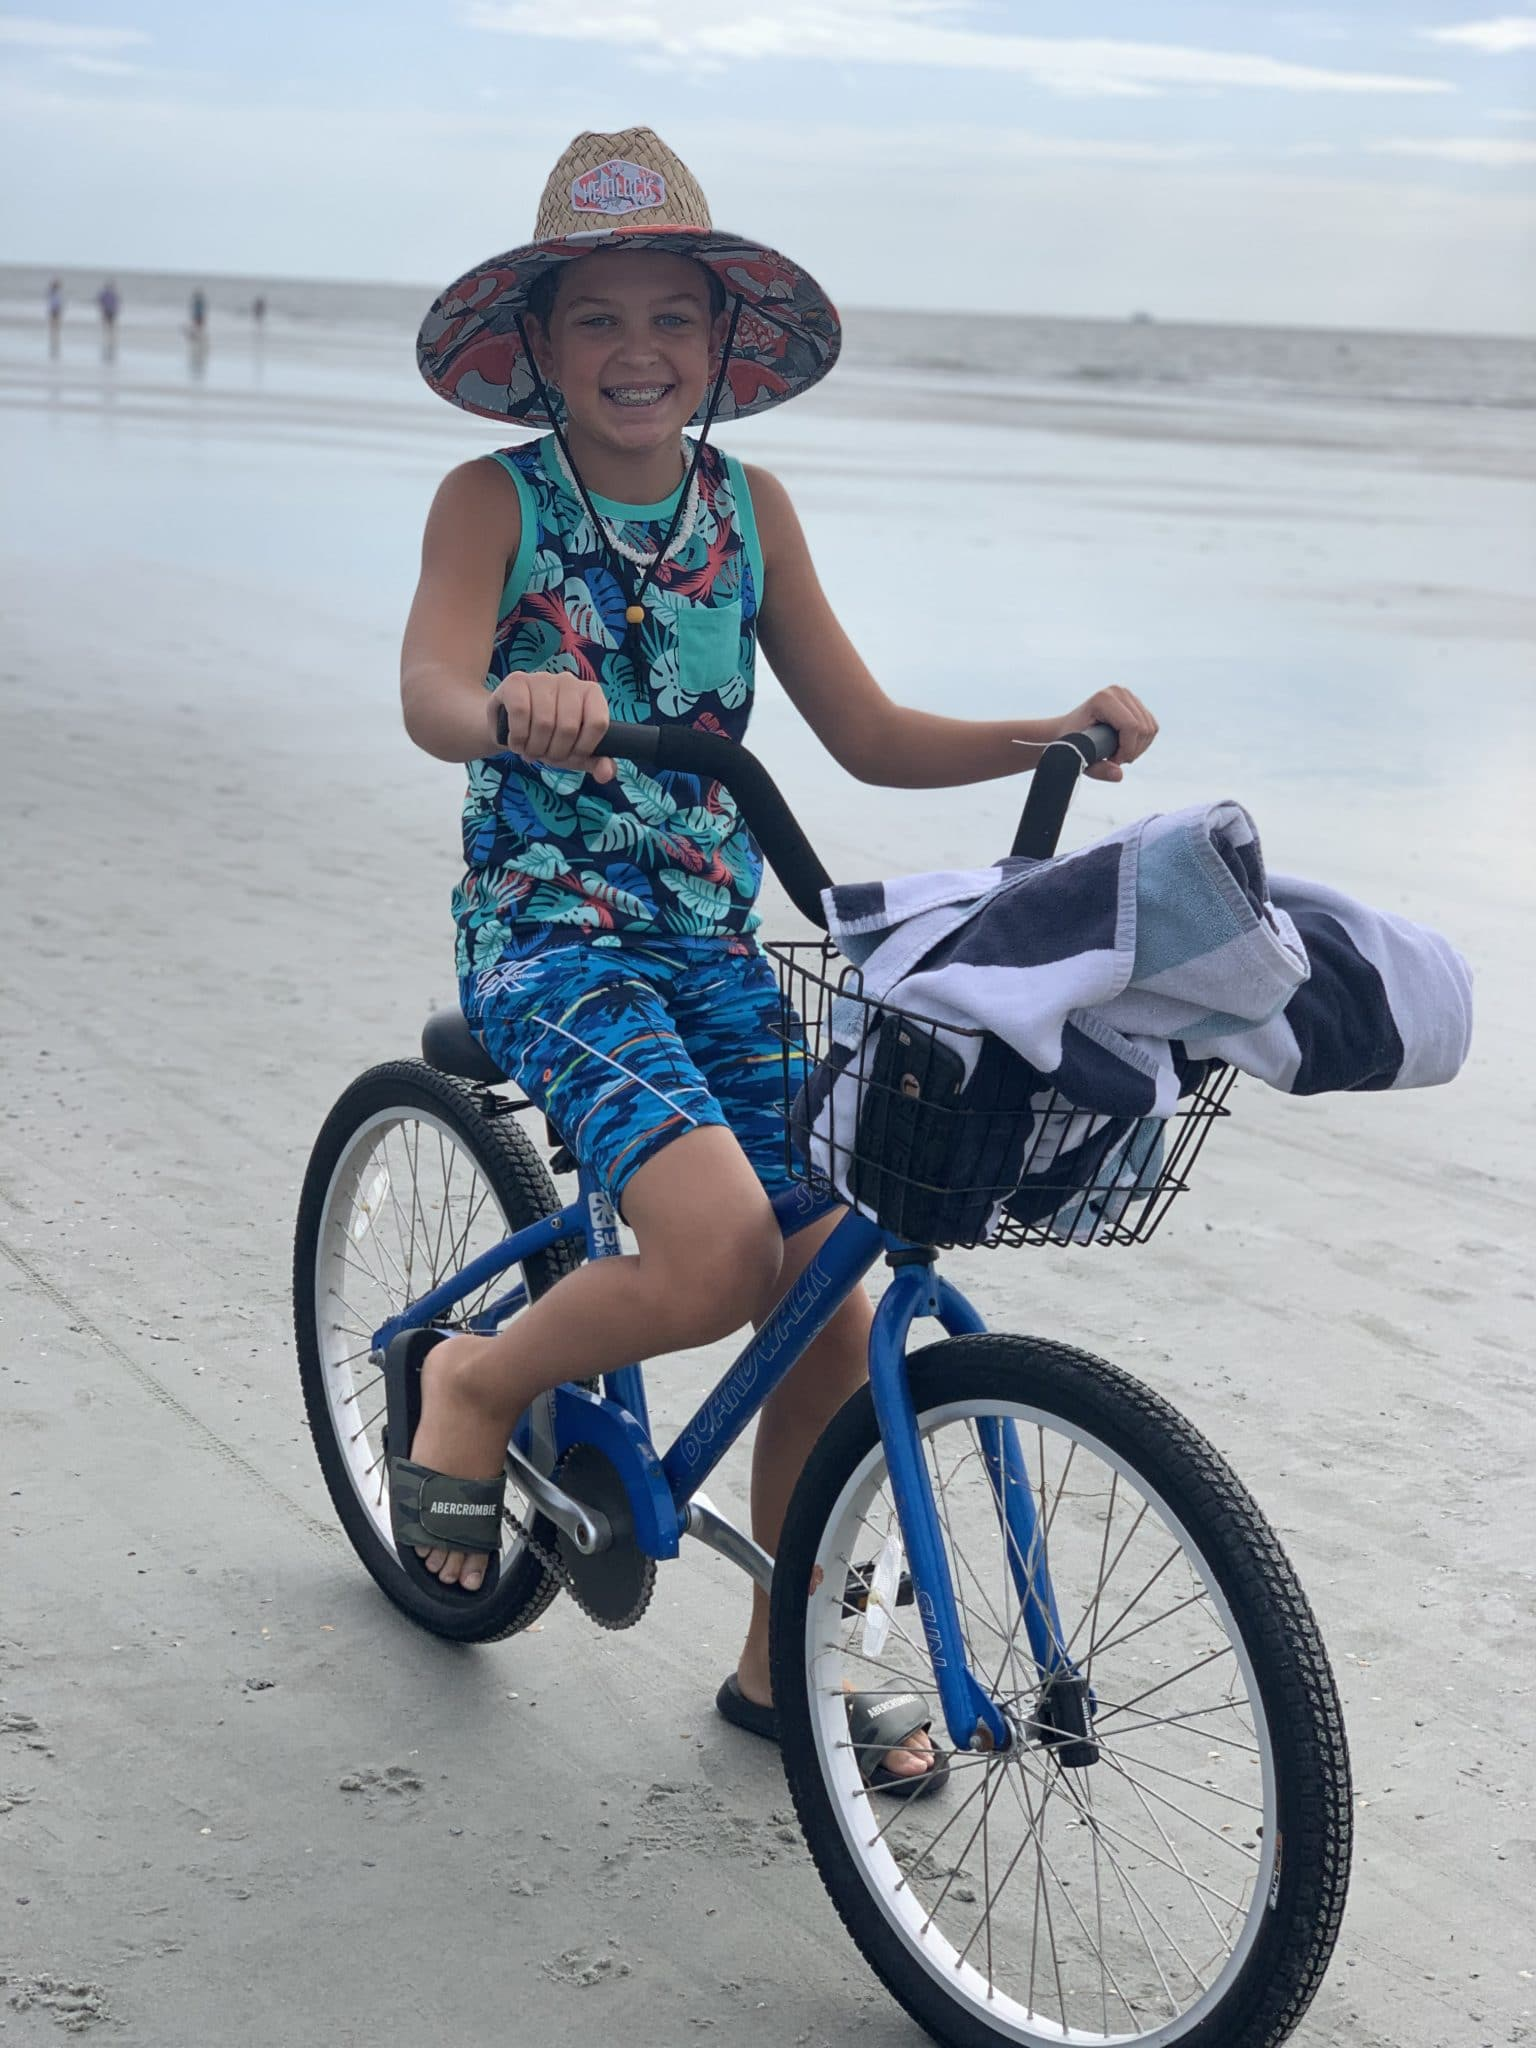 Bike riding Hilton Head Island, Family Biking, Beach Bike riding HHI, Stilettos and Diapers